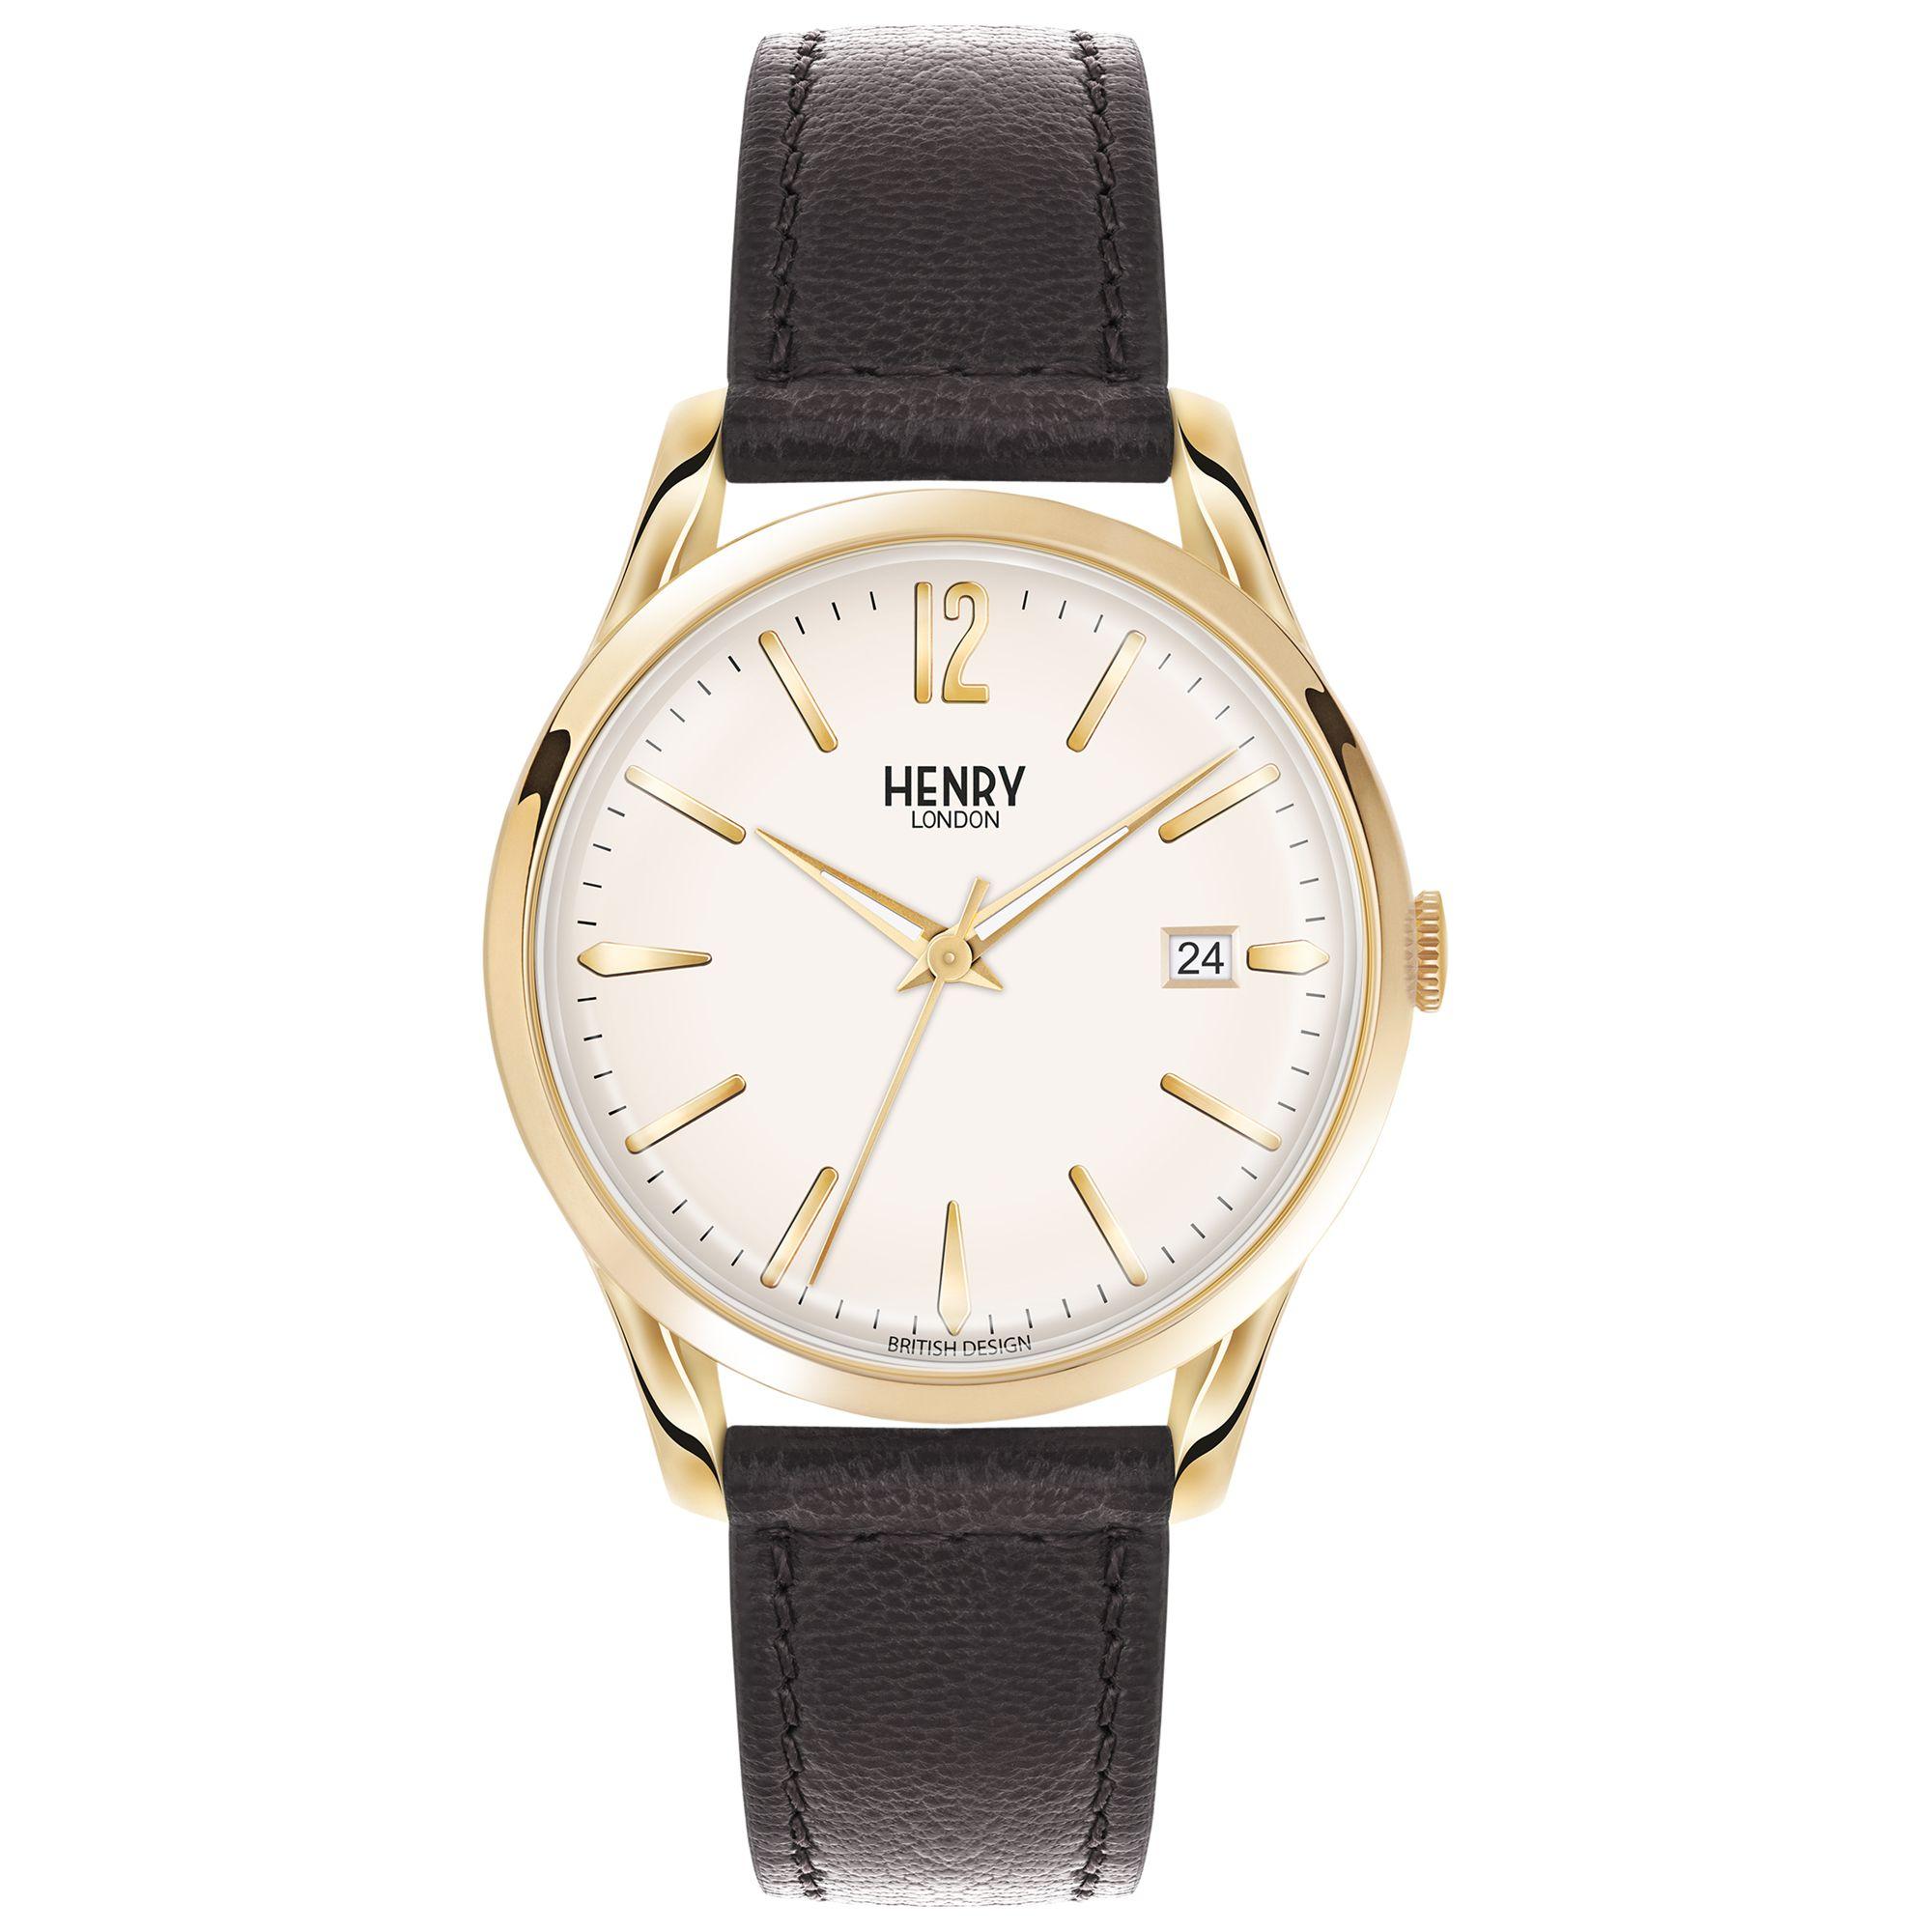 Henry London Henry London HL41-CS-0039 Unisex Westminster Date Leather Strap Watch, Black/White